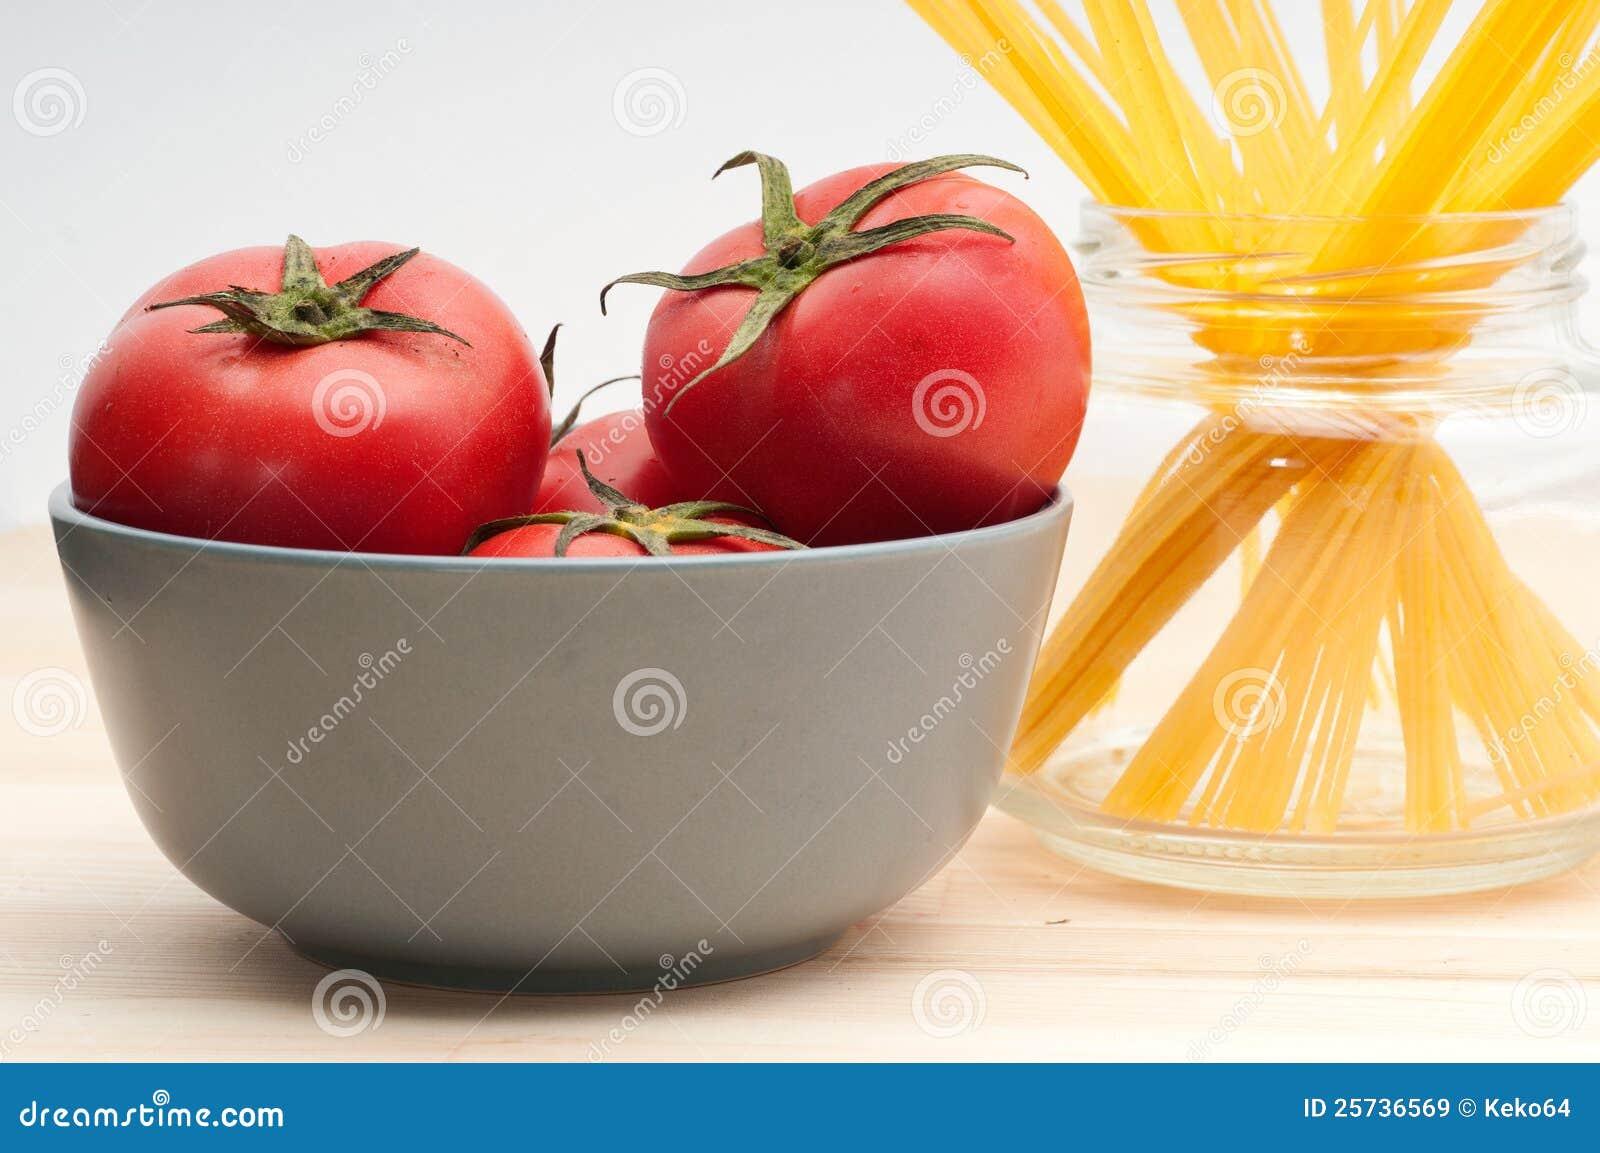 Fresh tomato and spaghetti pasta